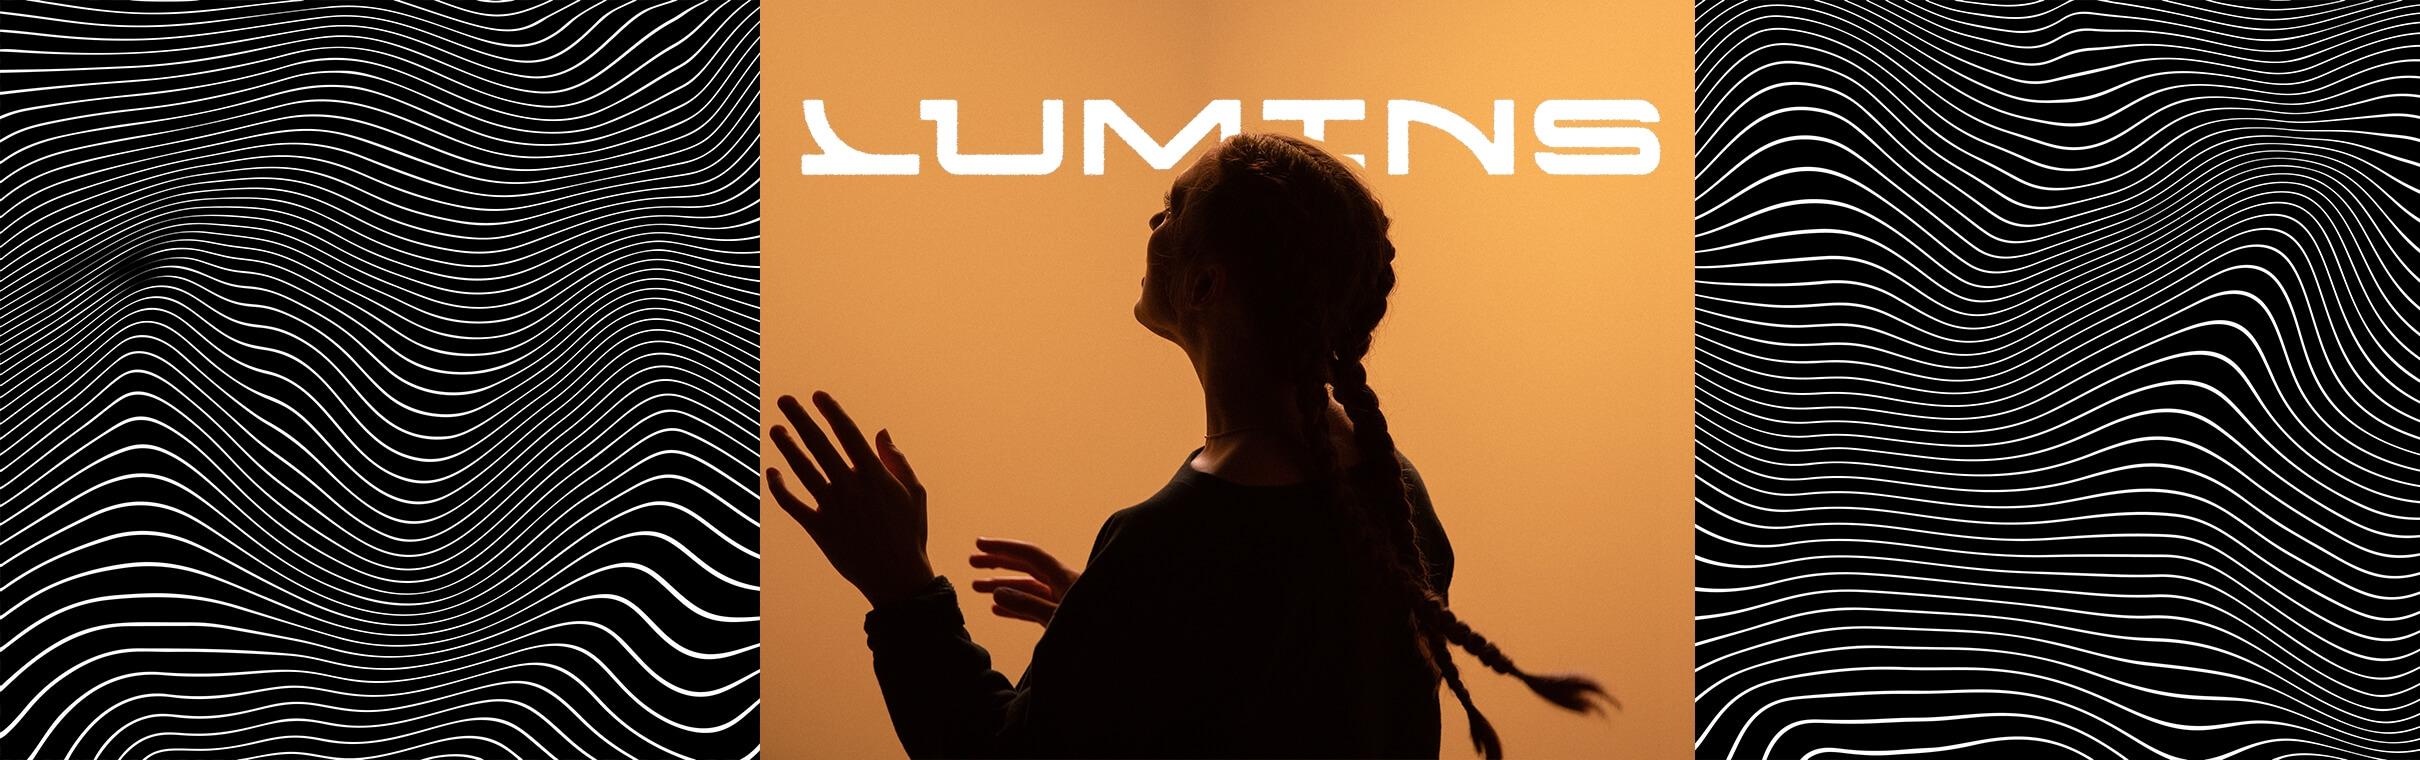 LUMINS